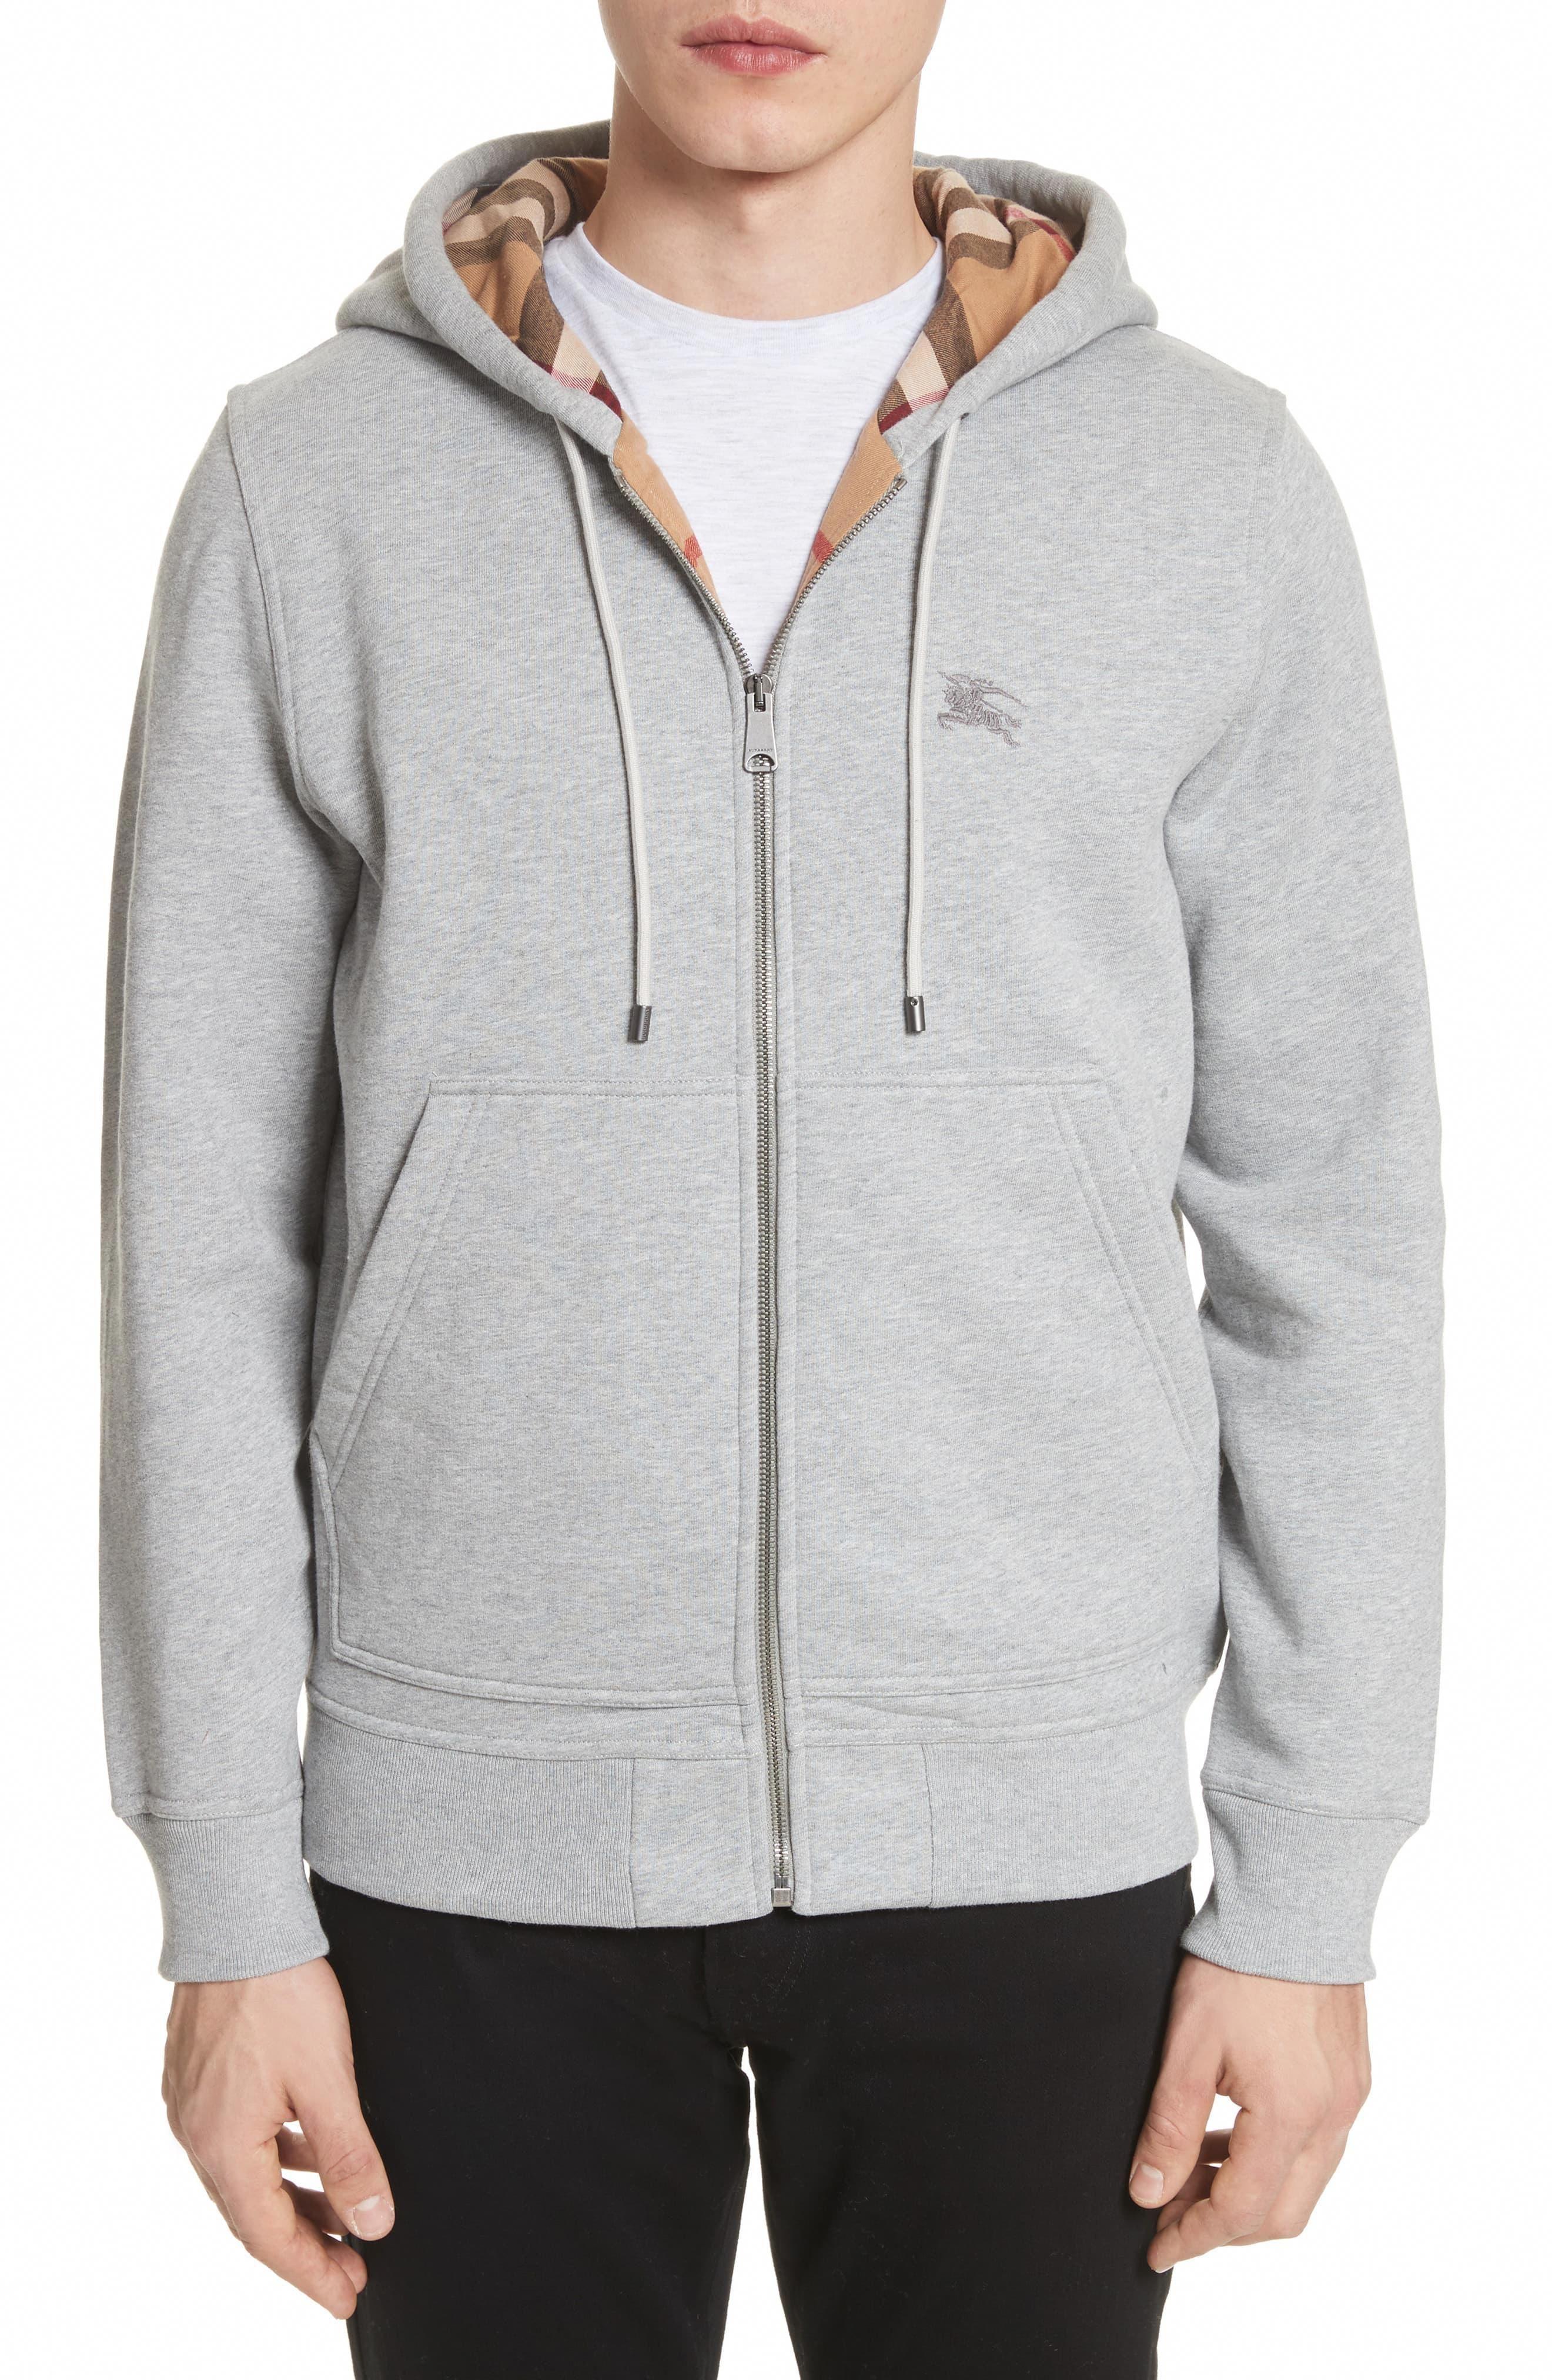 Men S Burberry Fordson Fleece Hoodie Size Small Grey Leatherjacketsformenred Mens Sweatshirts Hoodie Fleece Hoodie Hoodies Men [ 4048 x 2640 Pixel ]